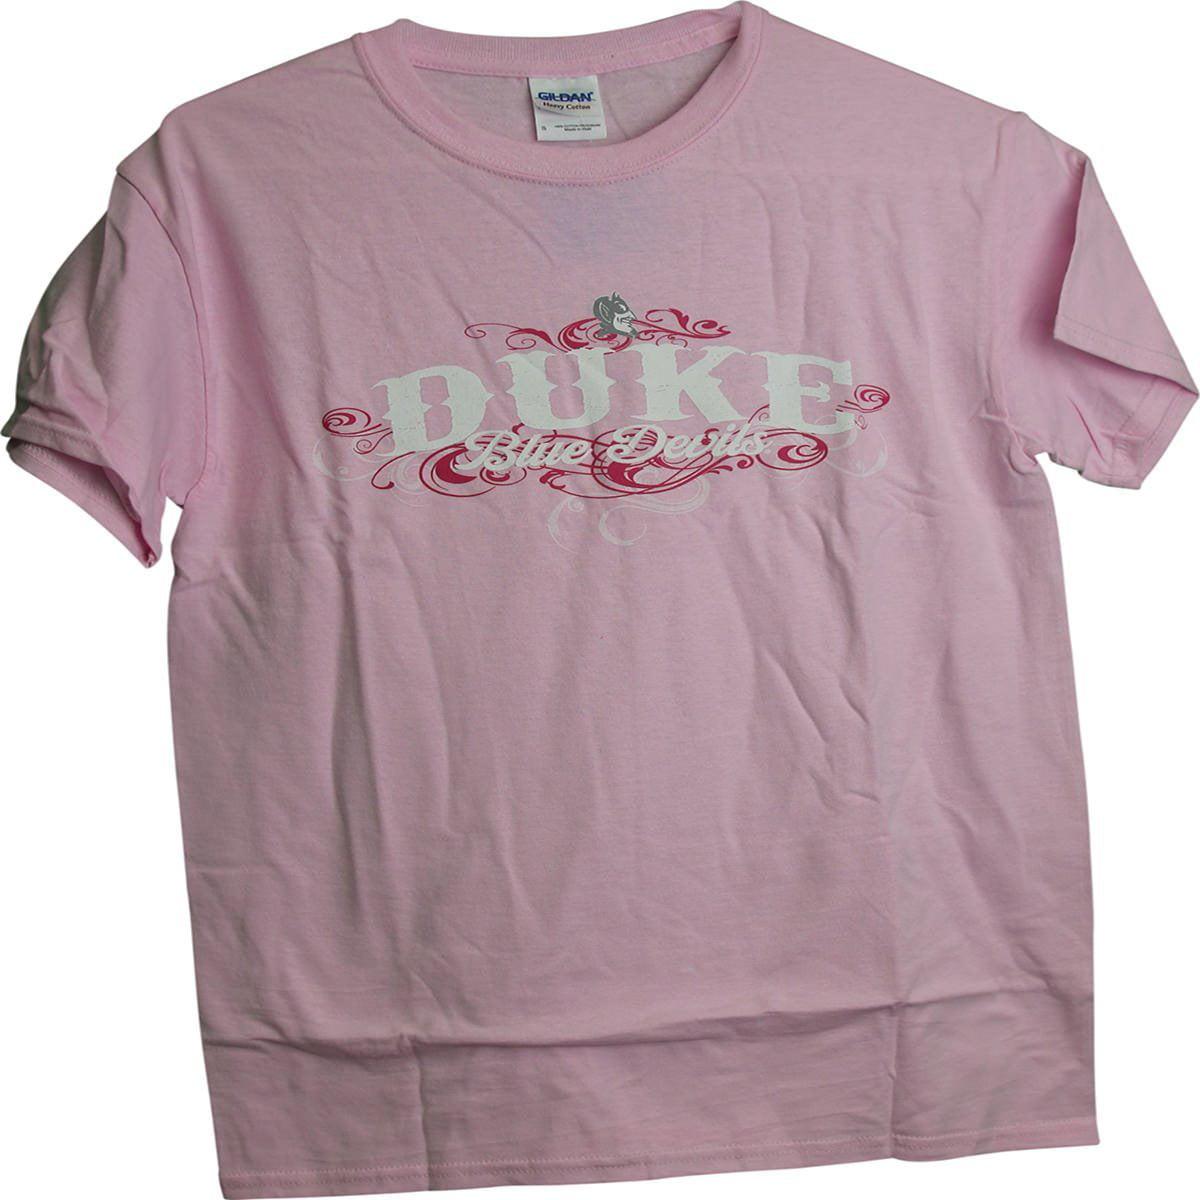 Duke Blue Devils Distressed name Tonal Mascot Ladies Women's Pink T-Shirt